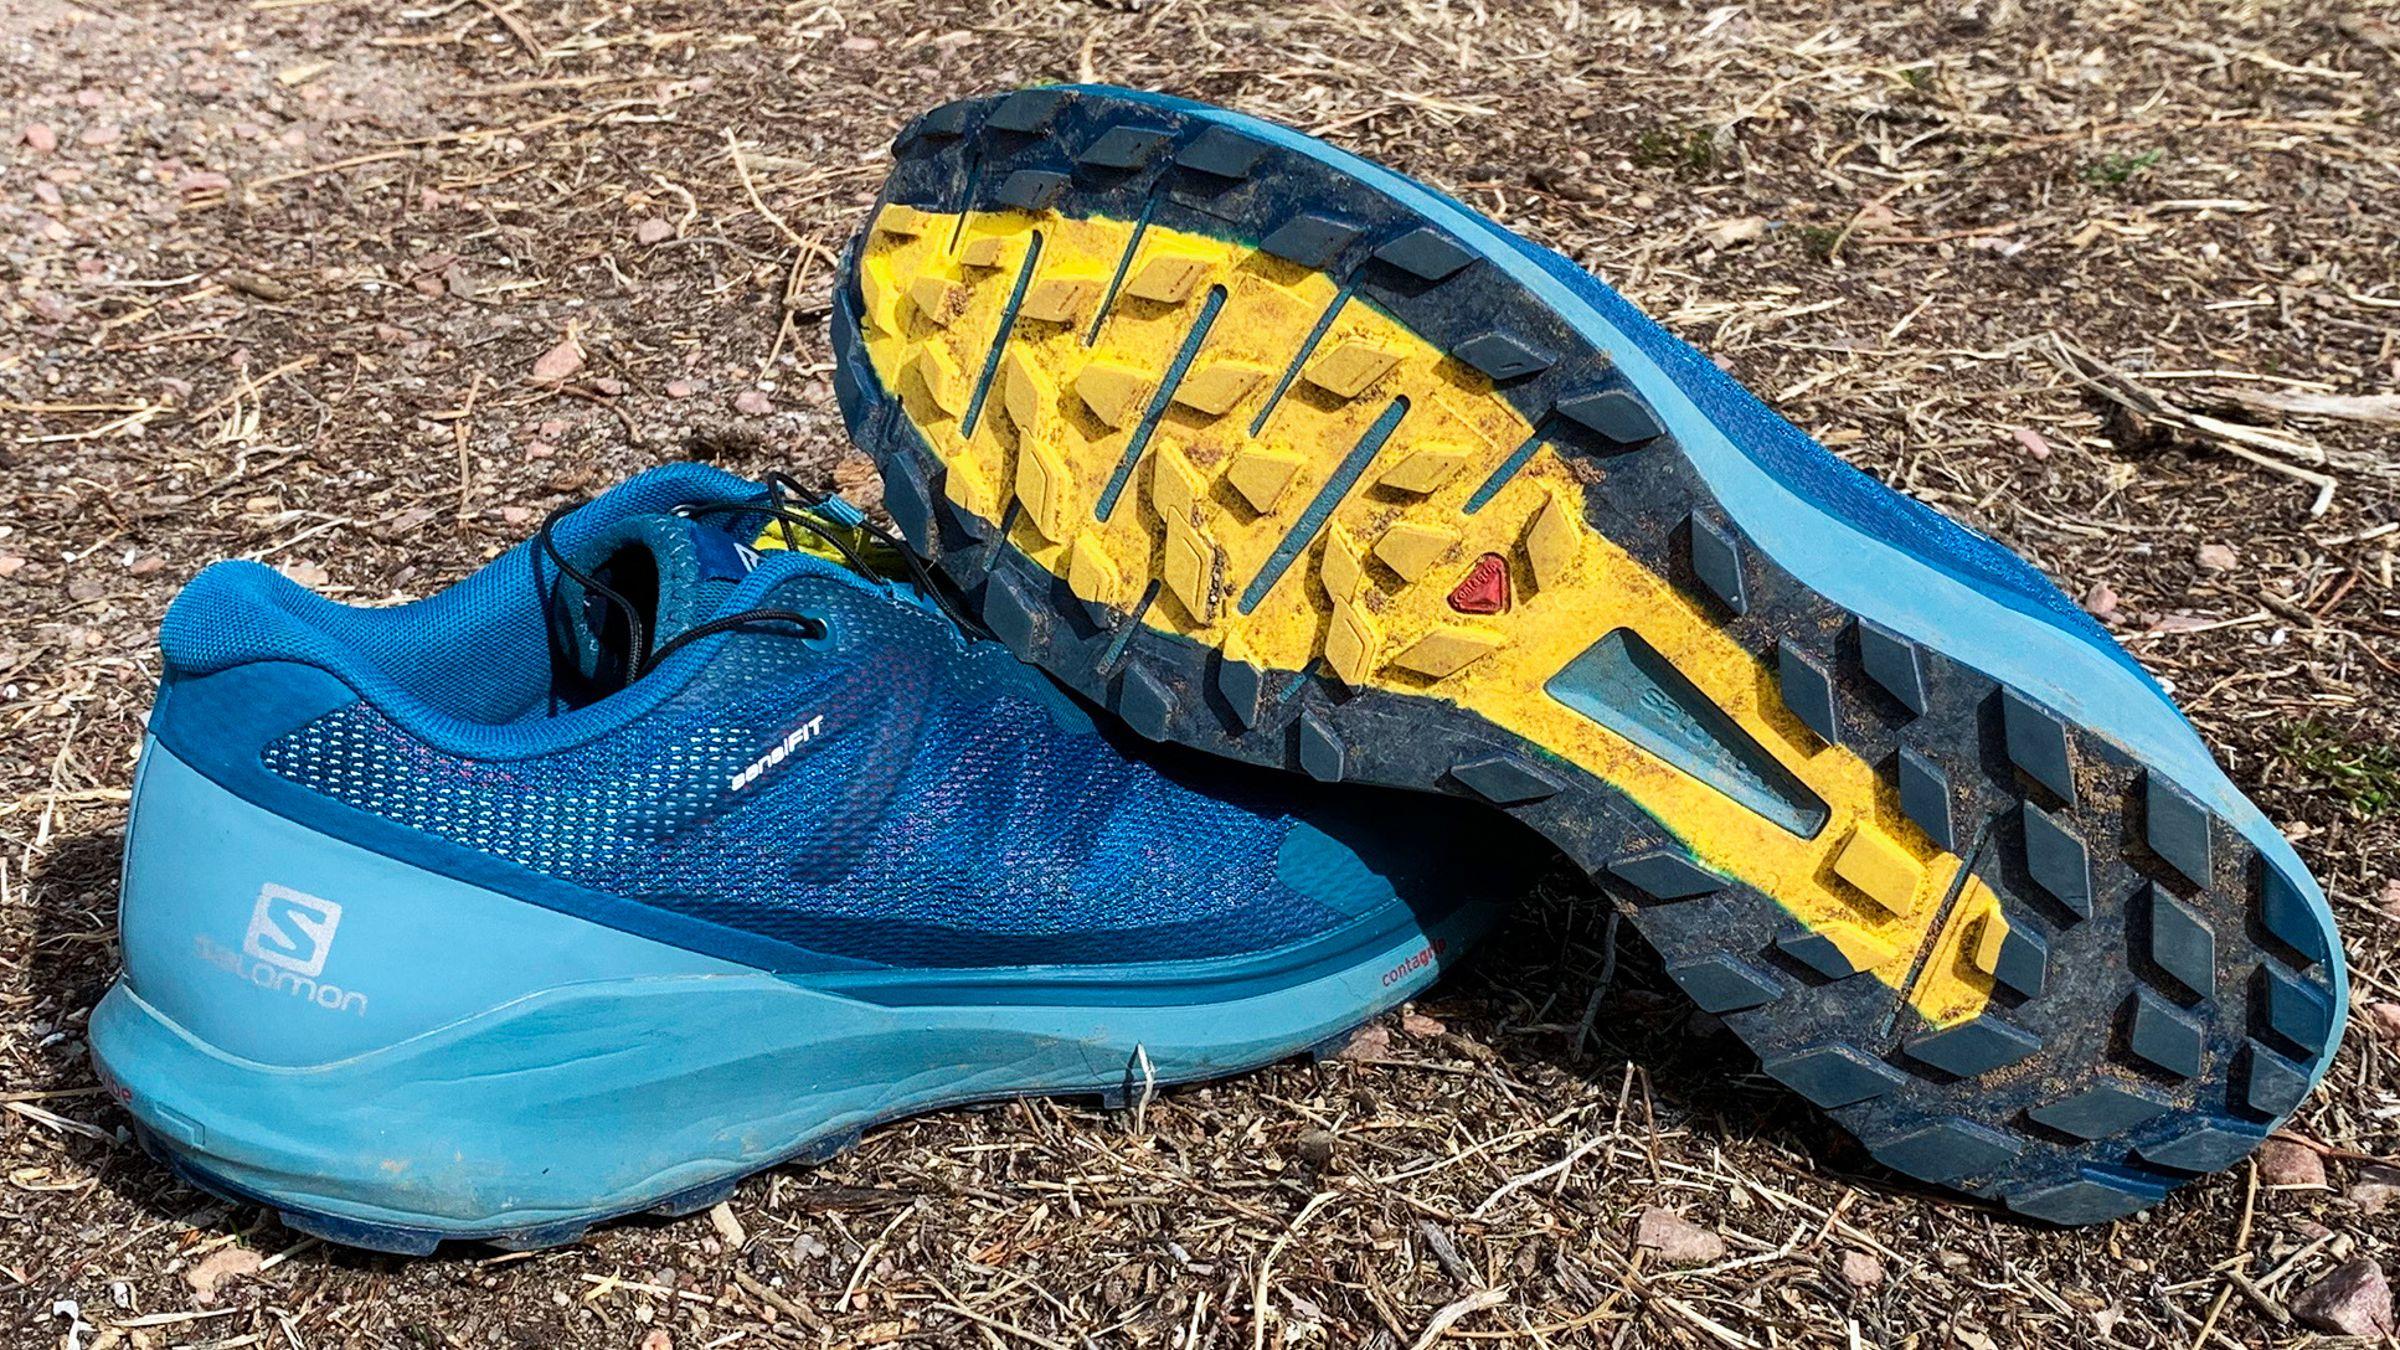 Salomon Sense Ride 3 la comodidad de Trail Running